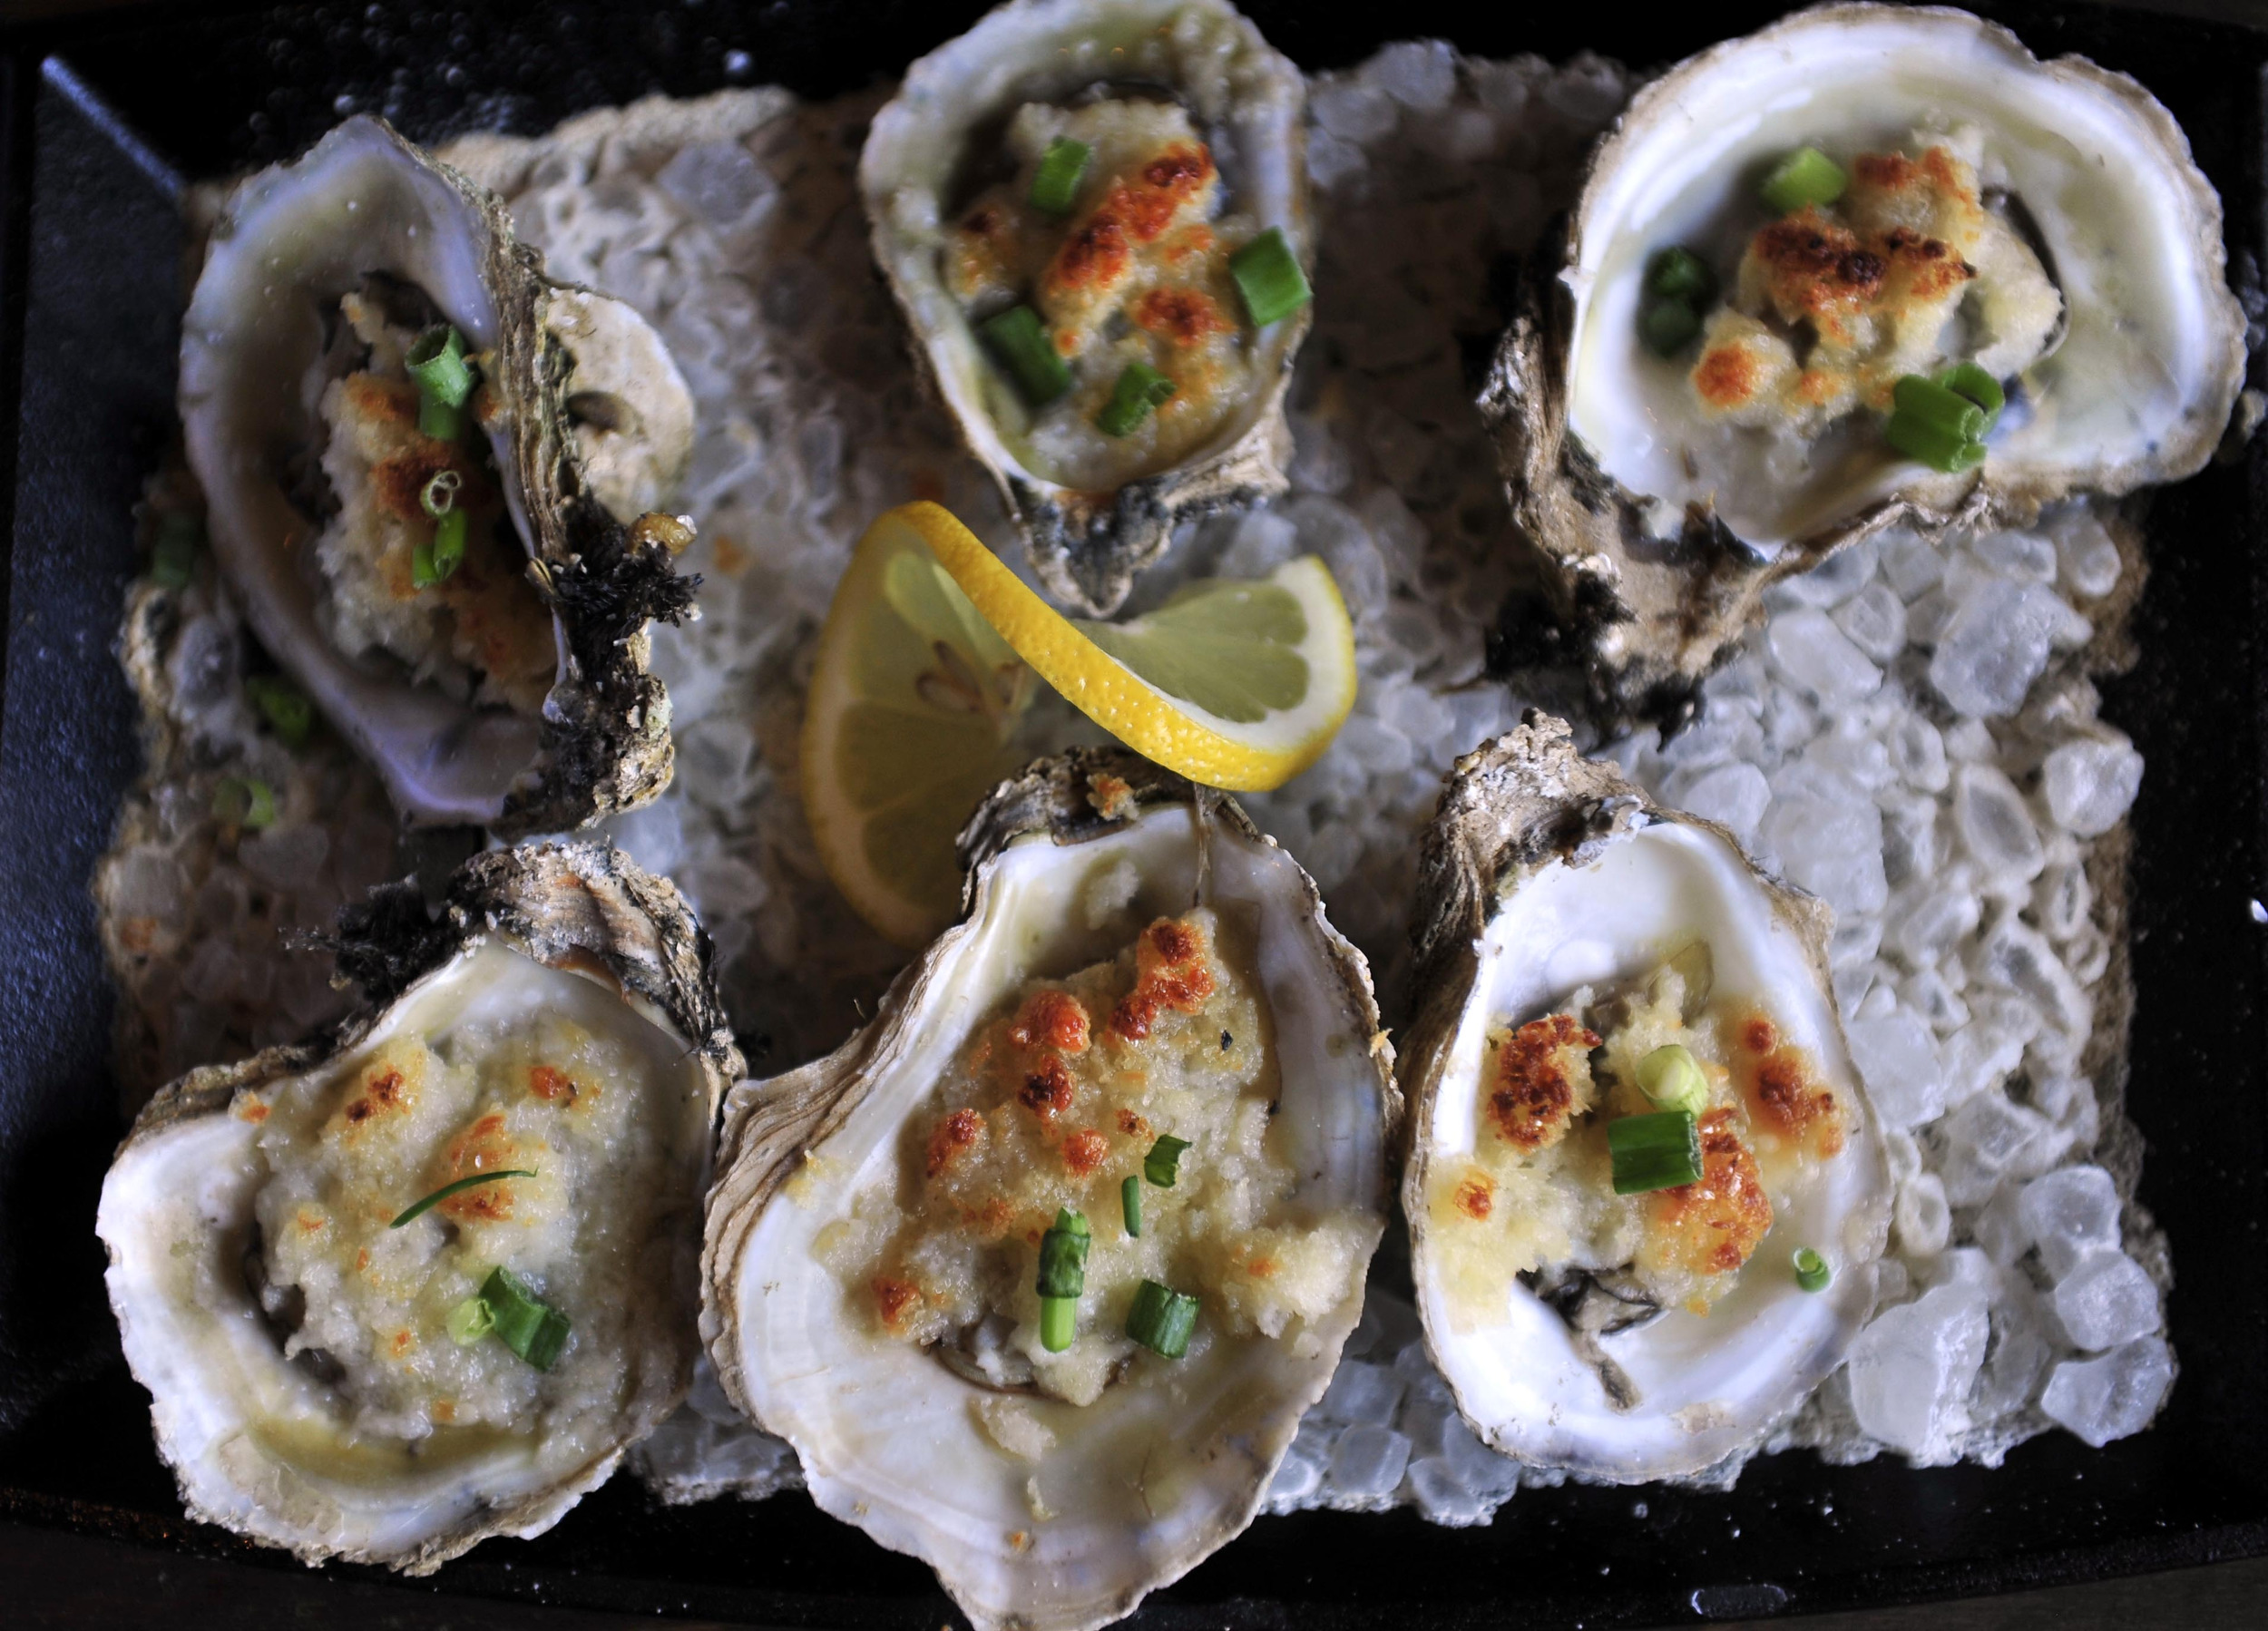 Roasted garlic & parmesan oysters at Urban Grub in Nashville, Tenn.